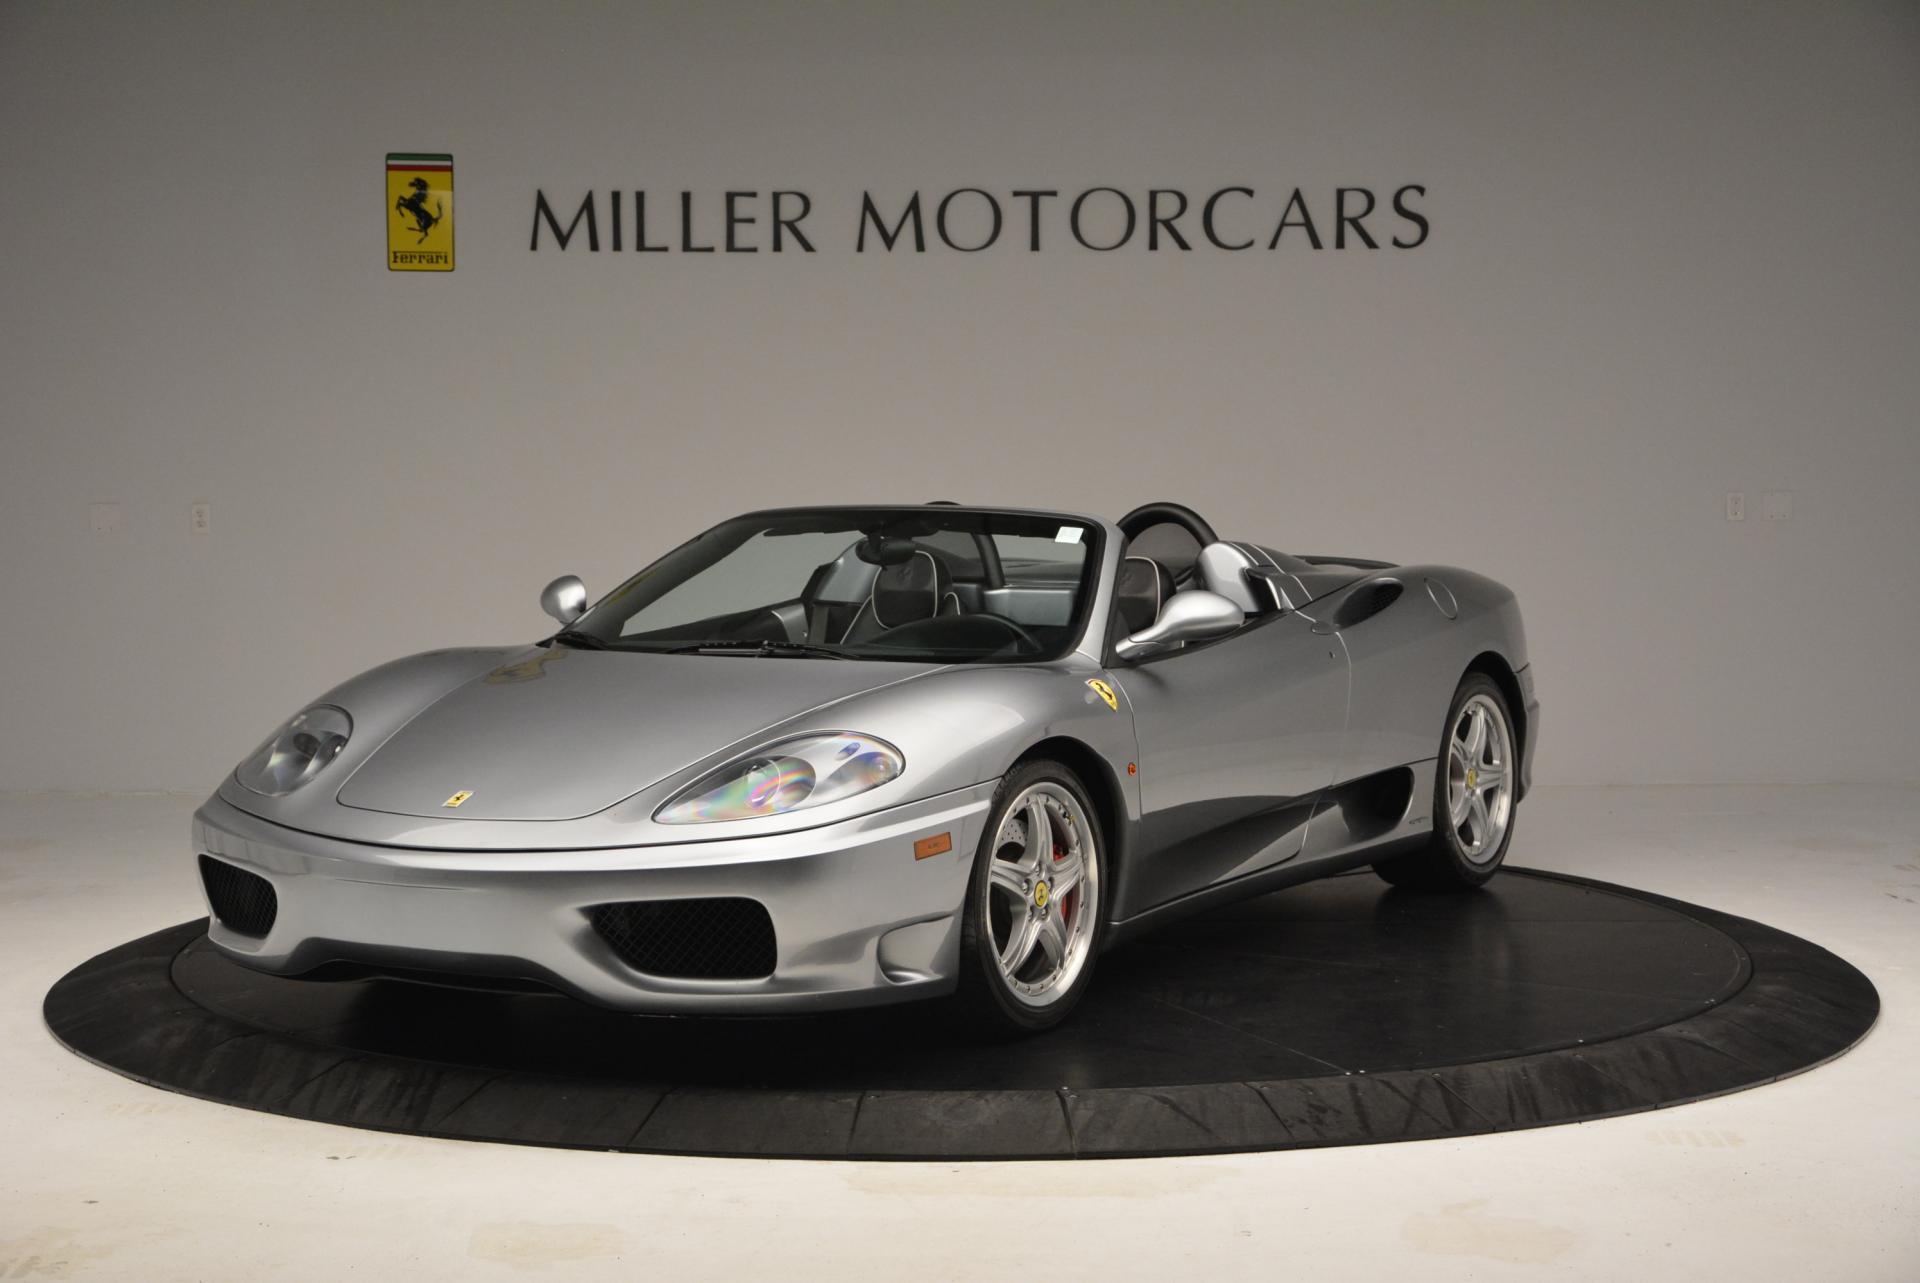 Used 2004 Ferrari 360 Spider 6-Speed Manual  For Sale In Greenwich, CT. Alfa Romeo of Greenwich, 4317 138_main